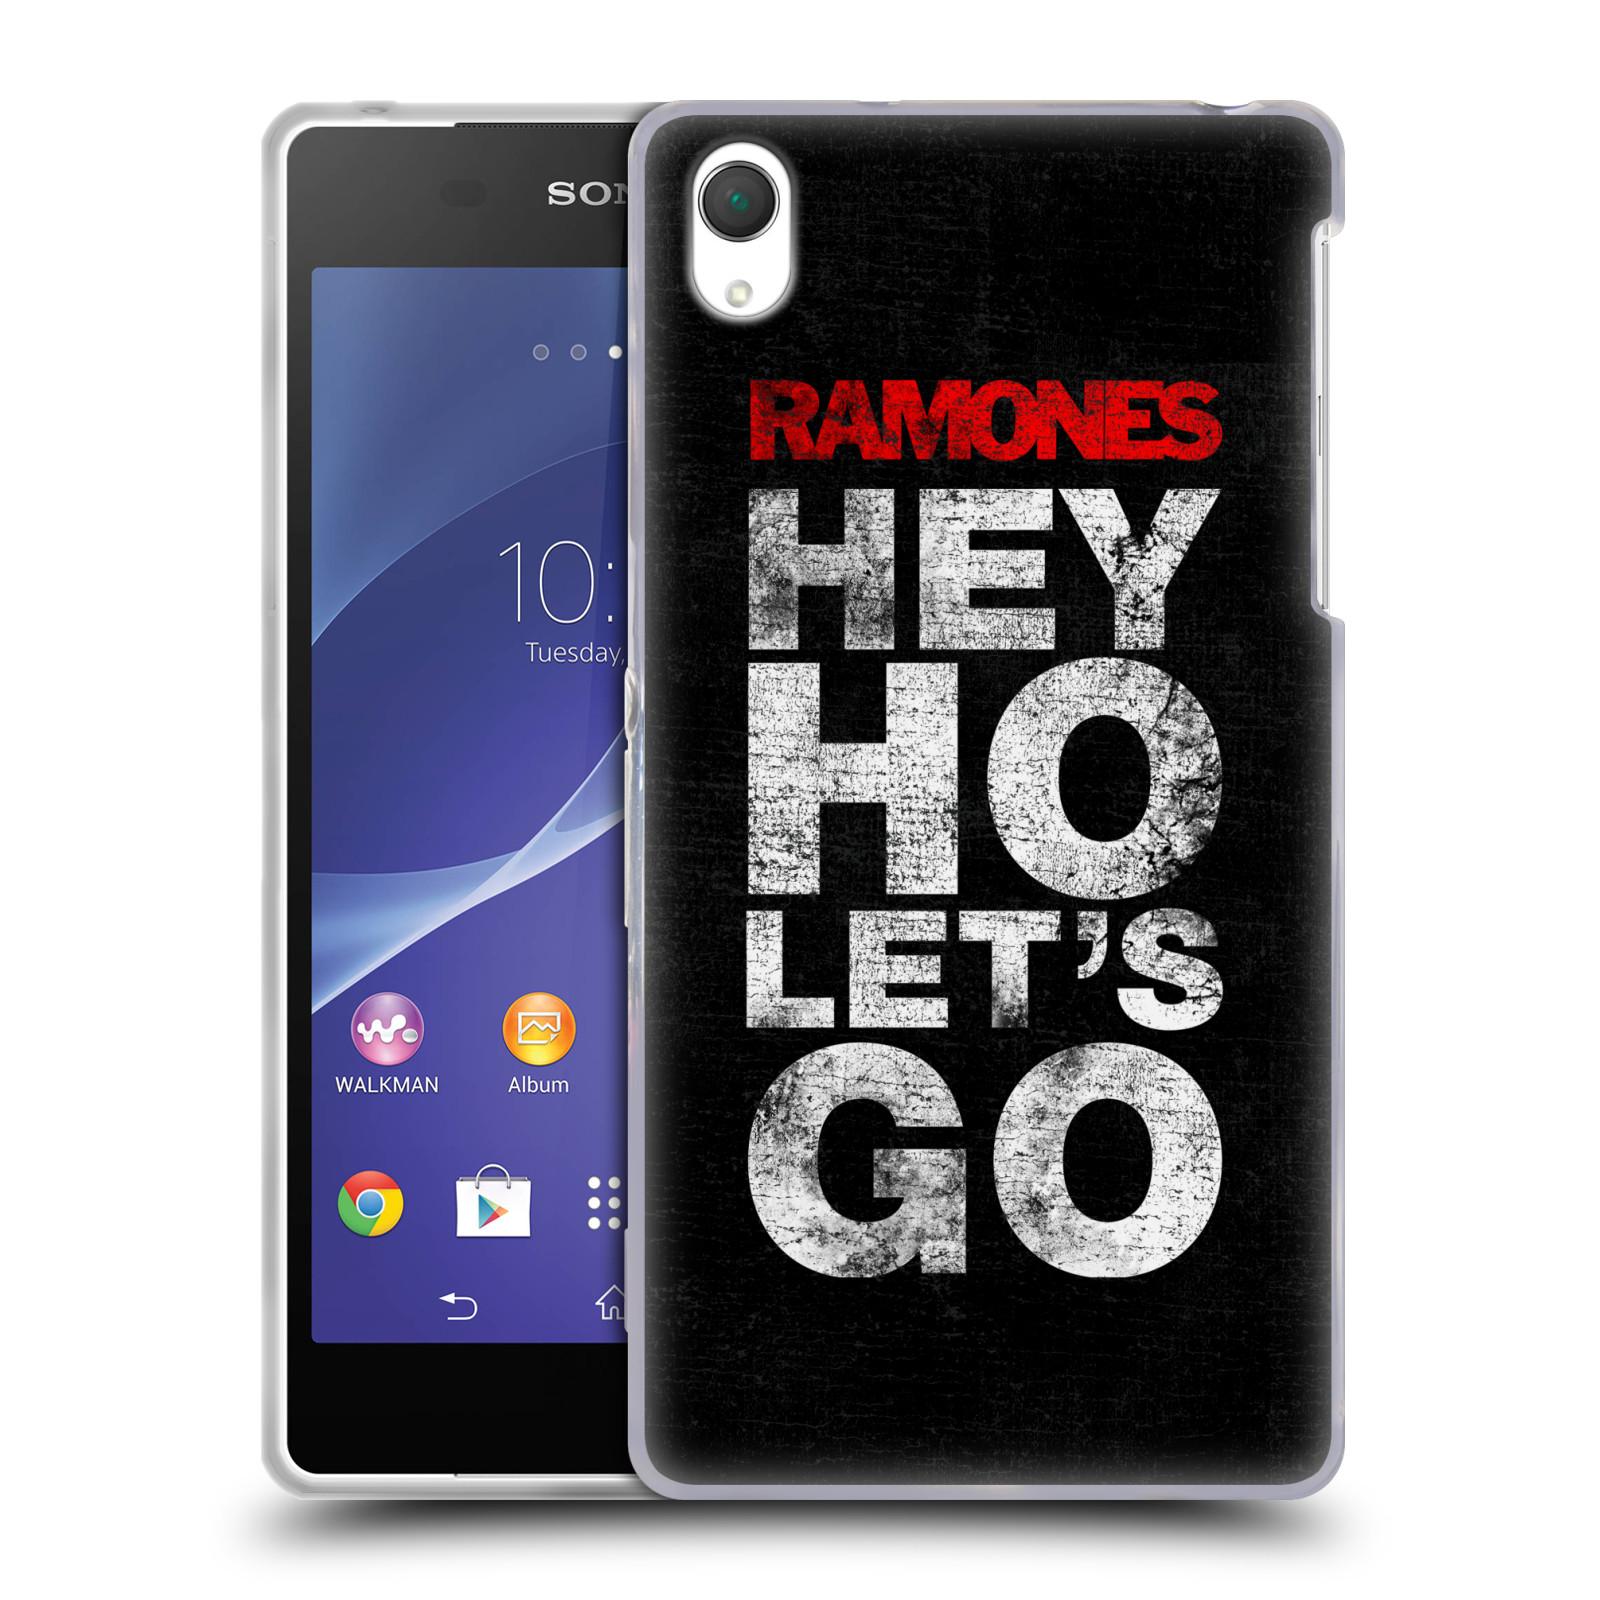 Silikonové pouzdro na mobil Sony Xperia Z2 D6503 HEAD CASE The Ramones - HEY HO LET´S GO (Silikonový kryt či obal na mobilní telefon s oficiálním licencovaným motivem The Ramones pro Sony Xperia Z2)